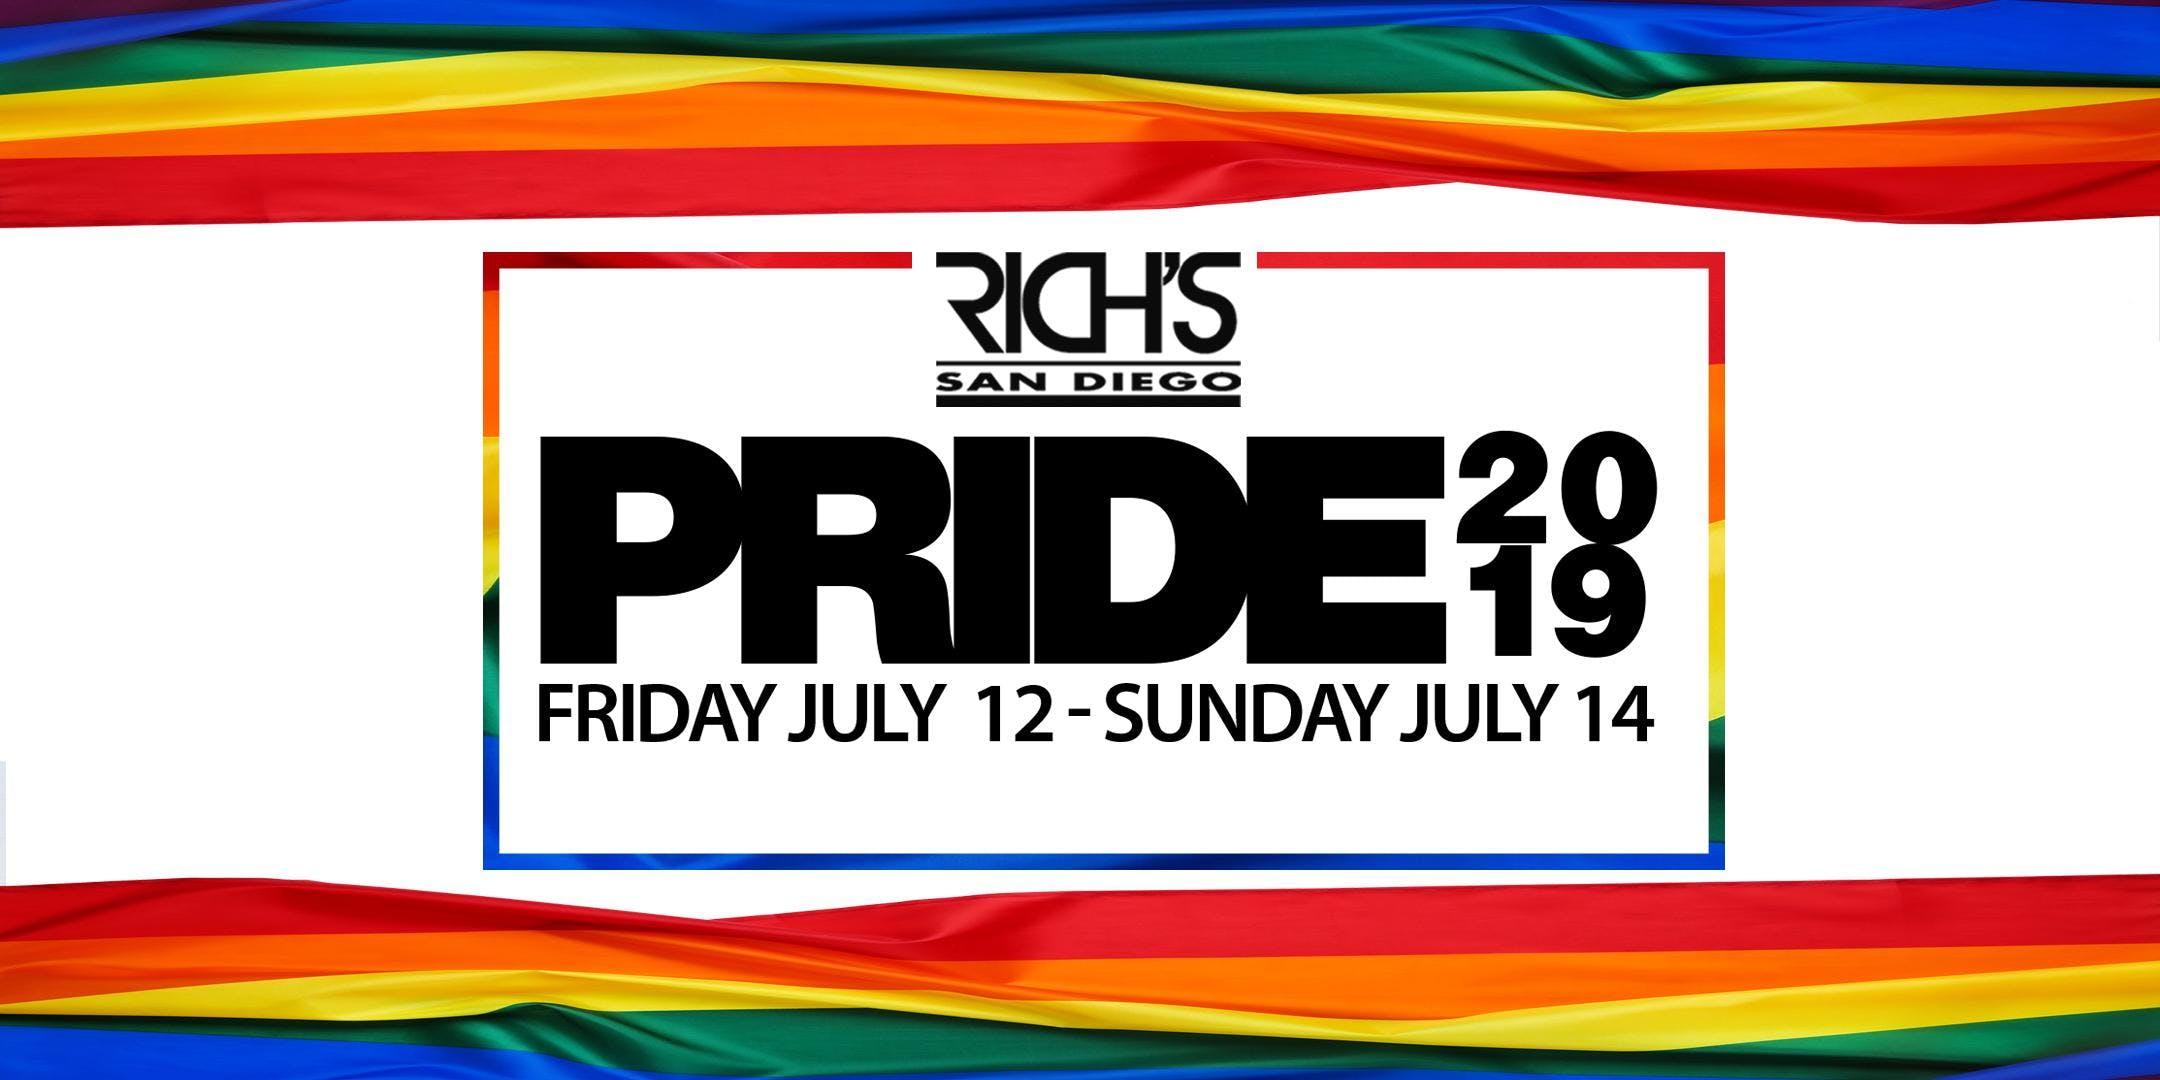 Rich's Pride 2019 VIP Weekend Pass